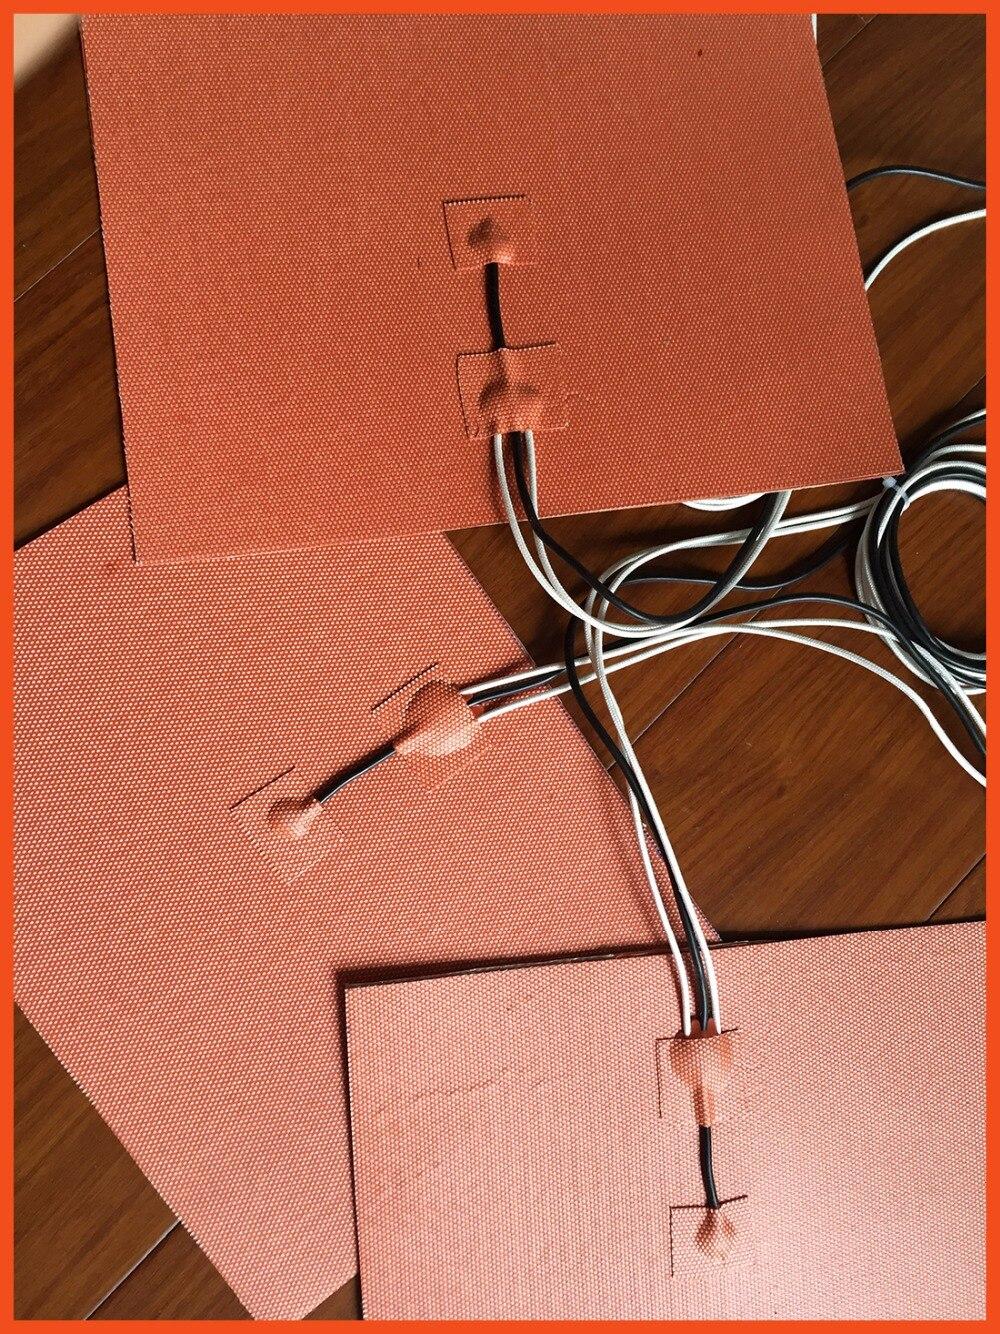 spedizione gratuita stampante 3d letto riscaldato siicone riscaldatore 300 x 300mm 24v 250w silicone heated bed heating element dia 400mm 900w 120v 3m ntc 100k round tank silicone heater huge 3d printer build plate heated bed electric heating plate element